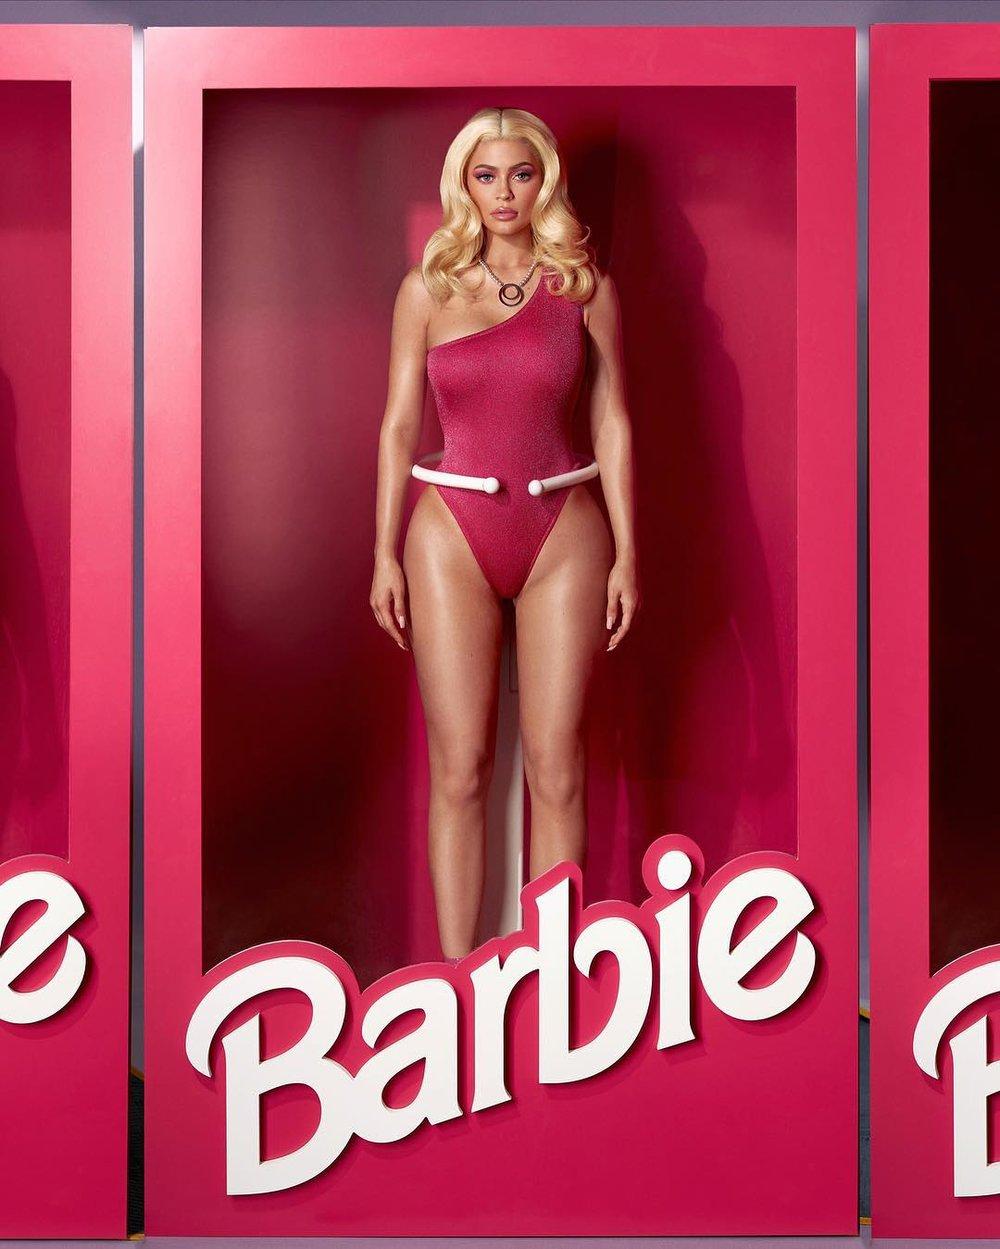 Kylie Jenner as Barbie // via instagram.com/kyliejenner